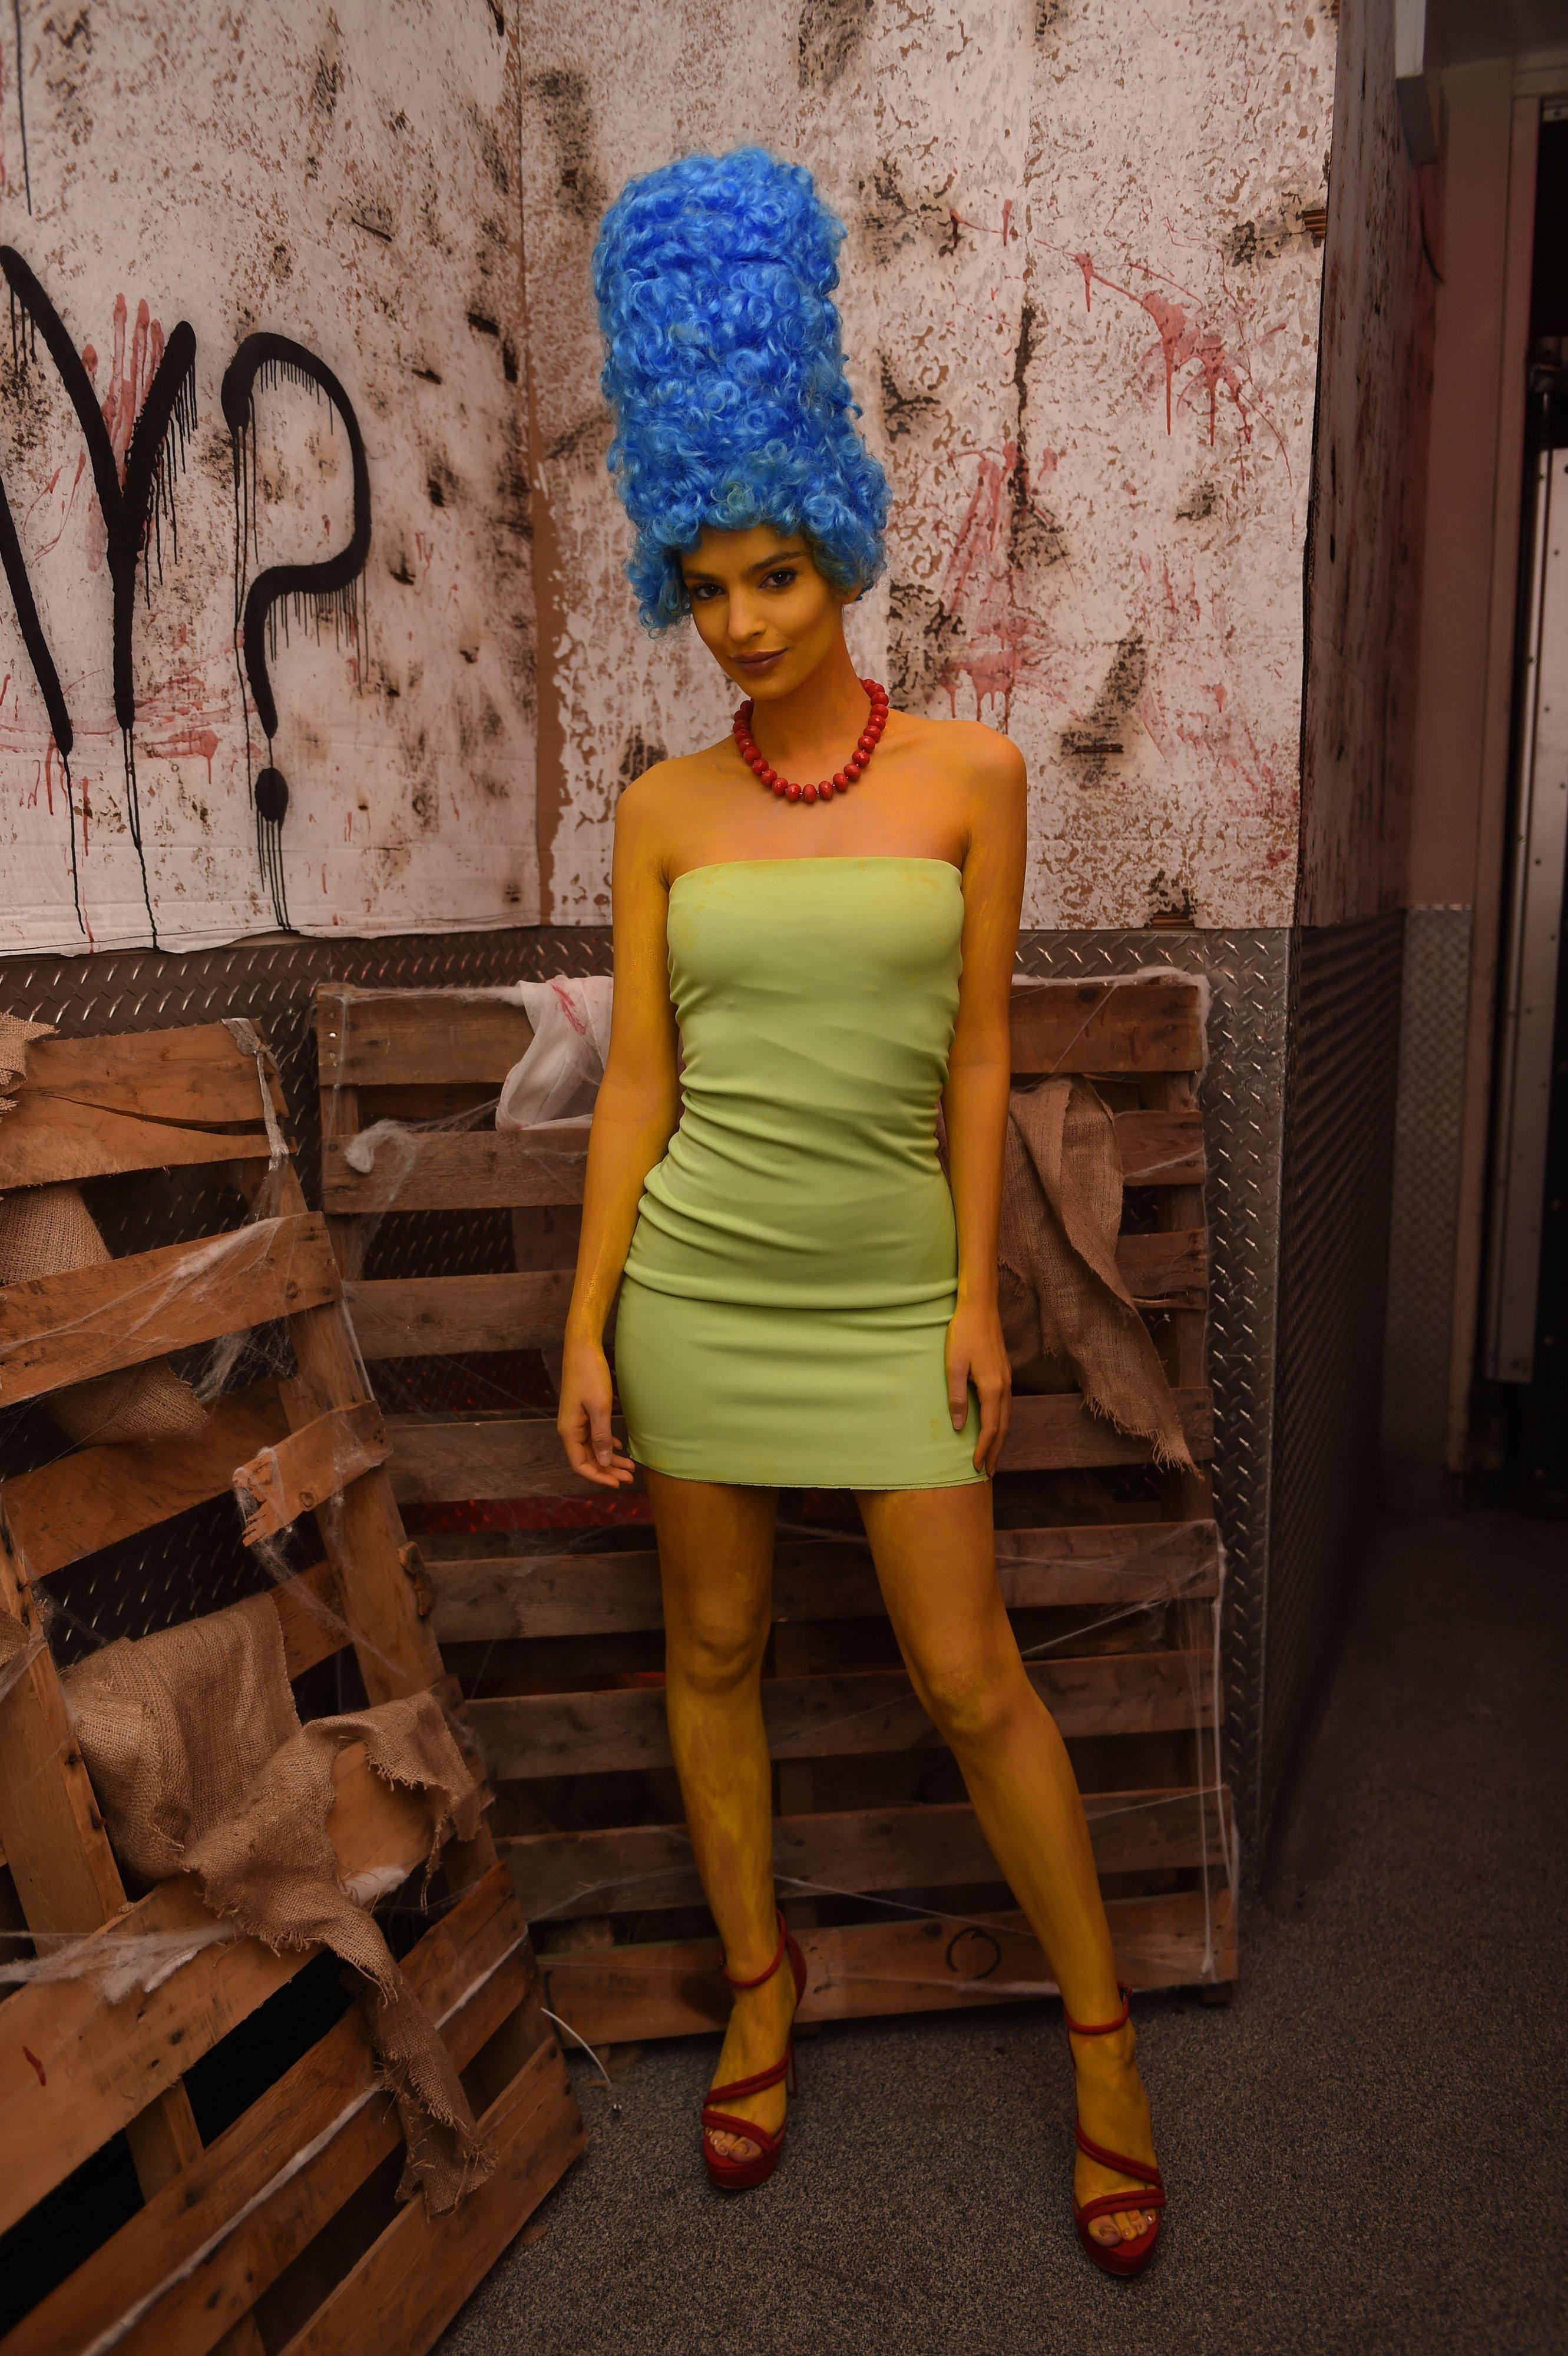 ~ concours de déguisements d'Halloween  31d89cd4f429a23facae040ba016228a